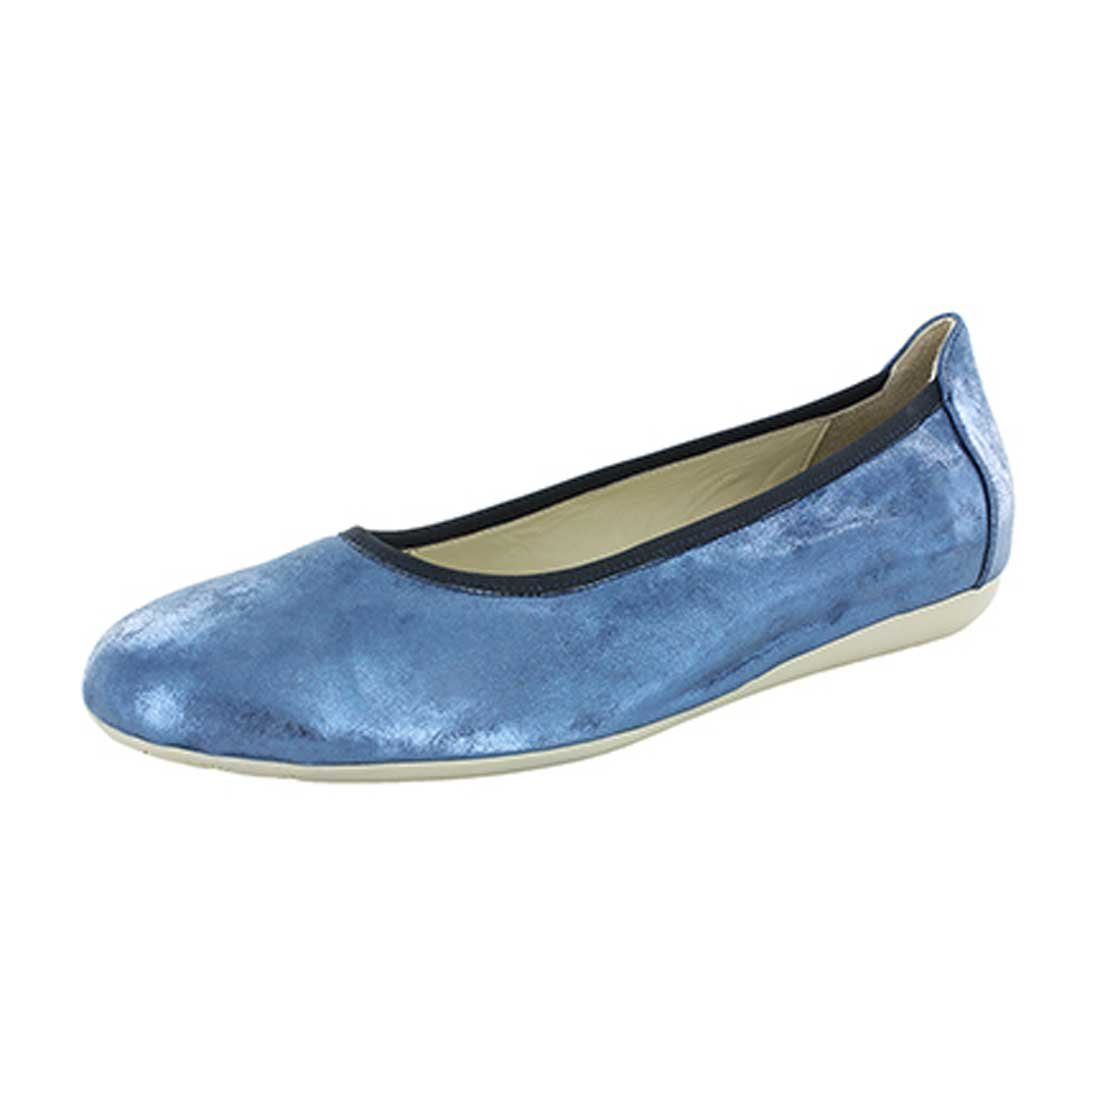 Wolky Comfort Ballet Pumps Tampa B01LY9L26J 37 M EU|Amalia Blue